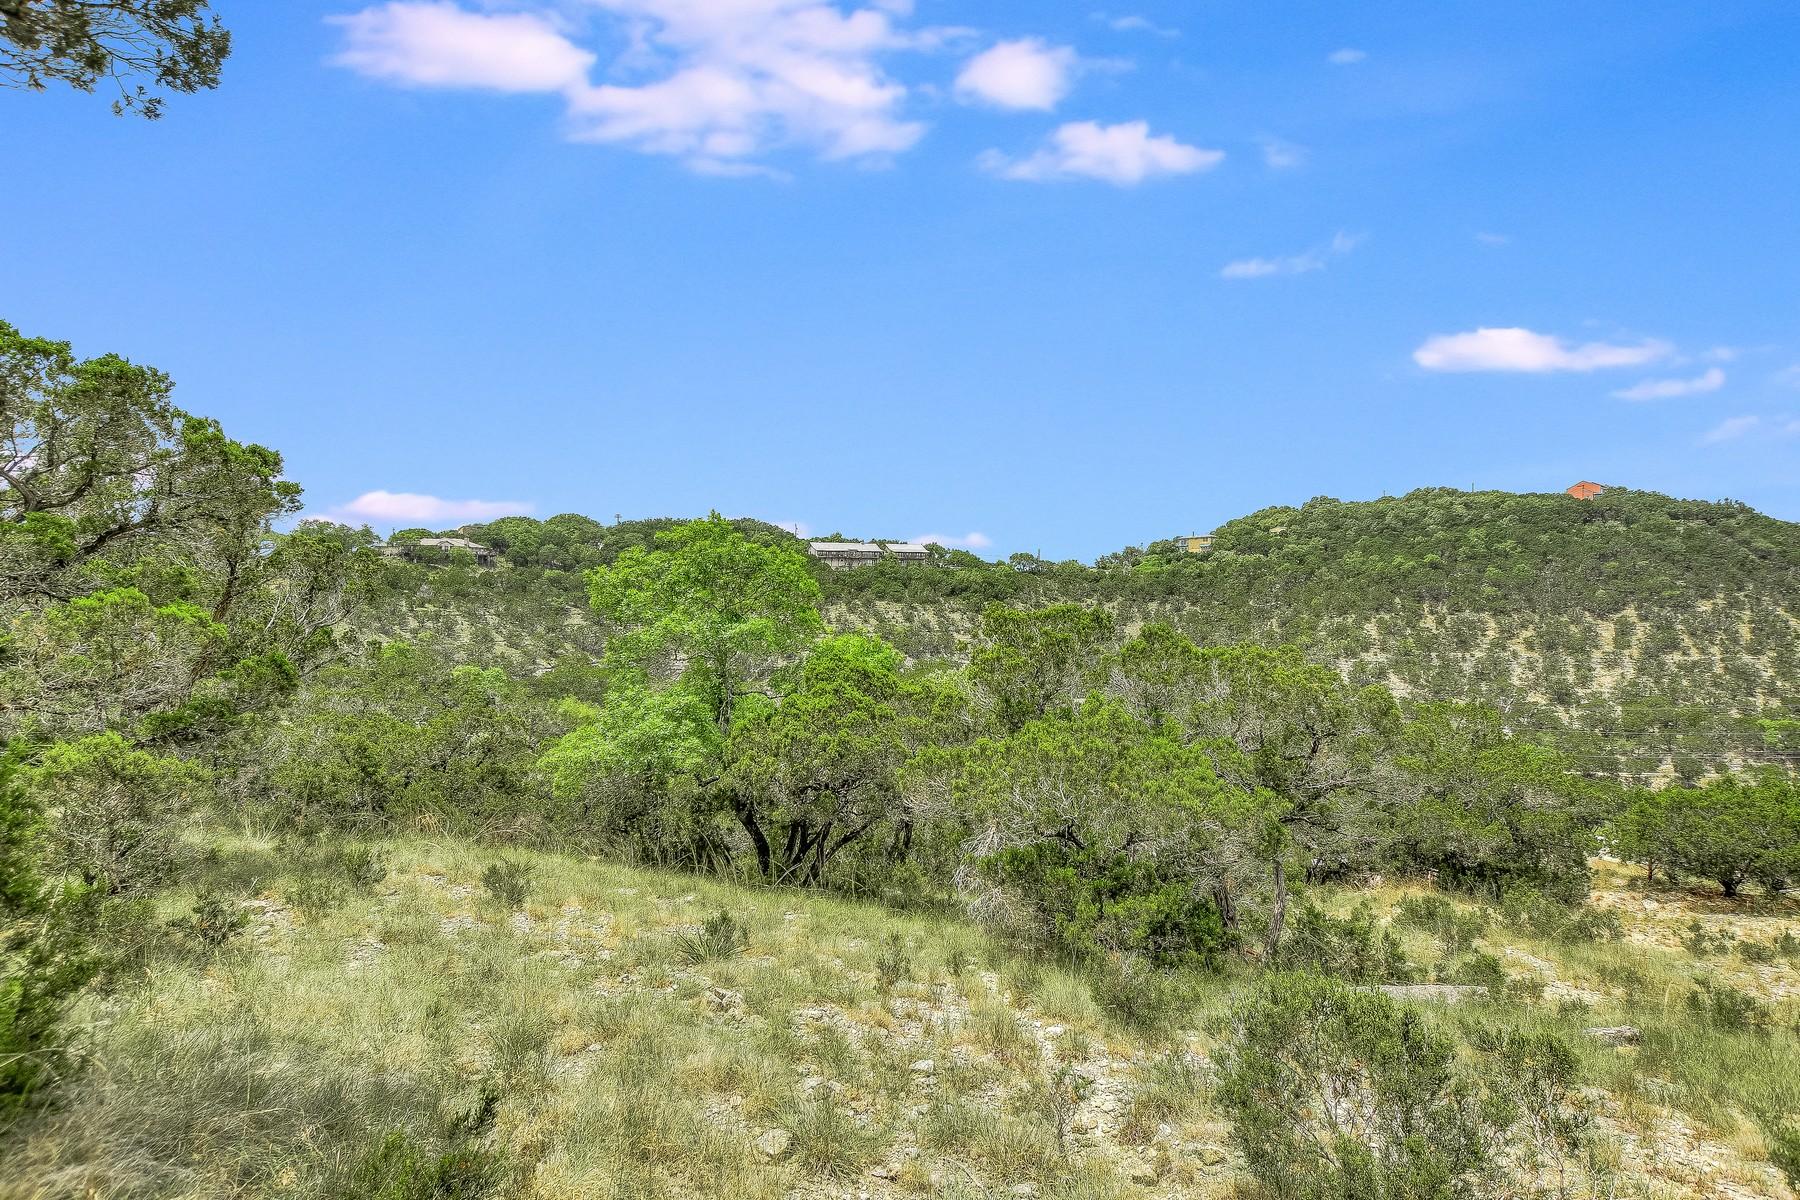 Terreno por un Venta en Majestic Hill Country Views for Miles! 000 Climbing Way Wimberley, Texas 78676 Estados Unidos